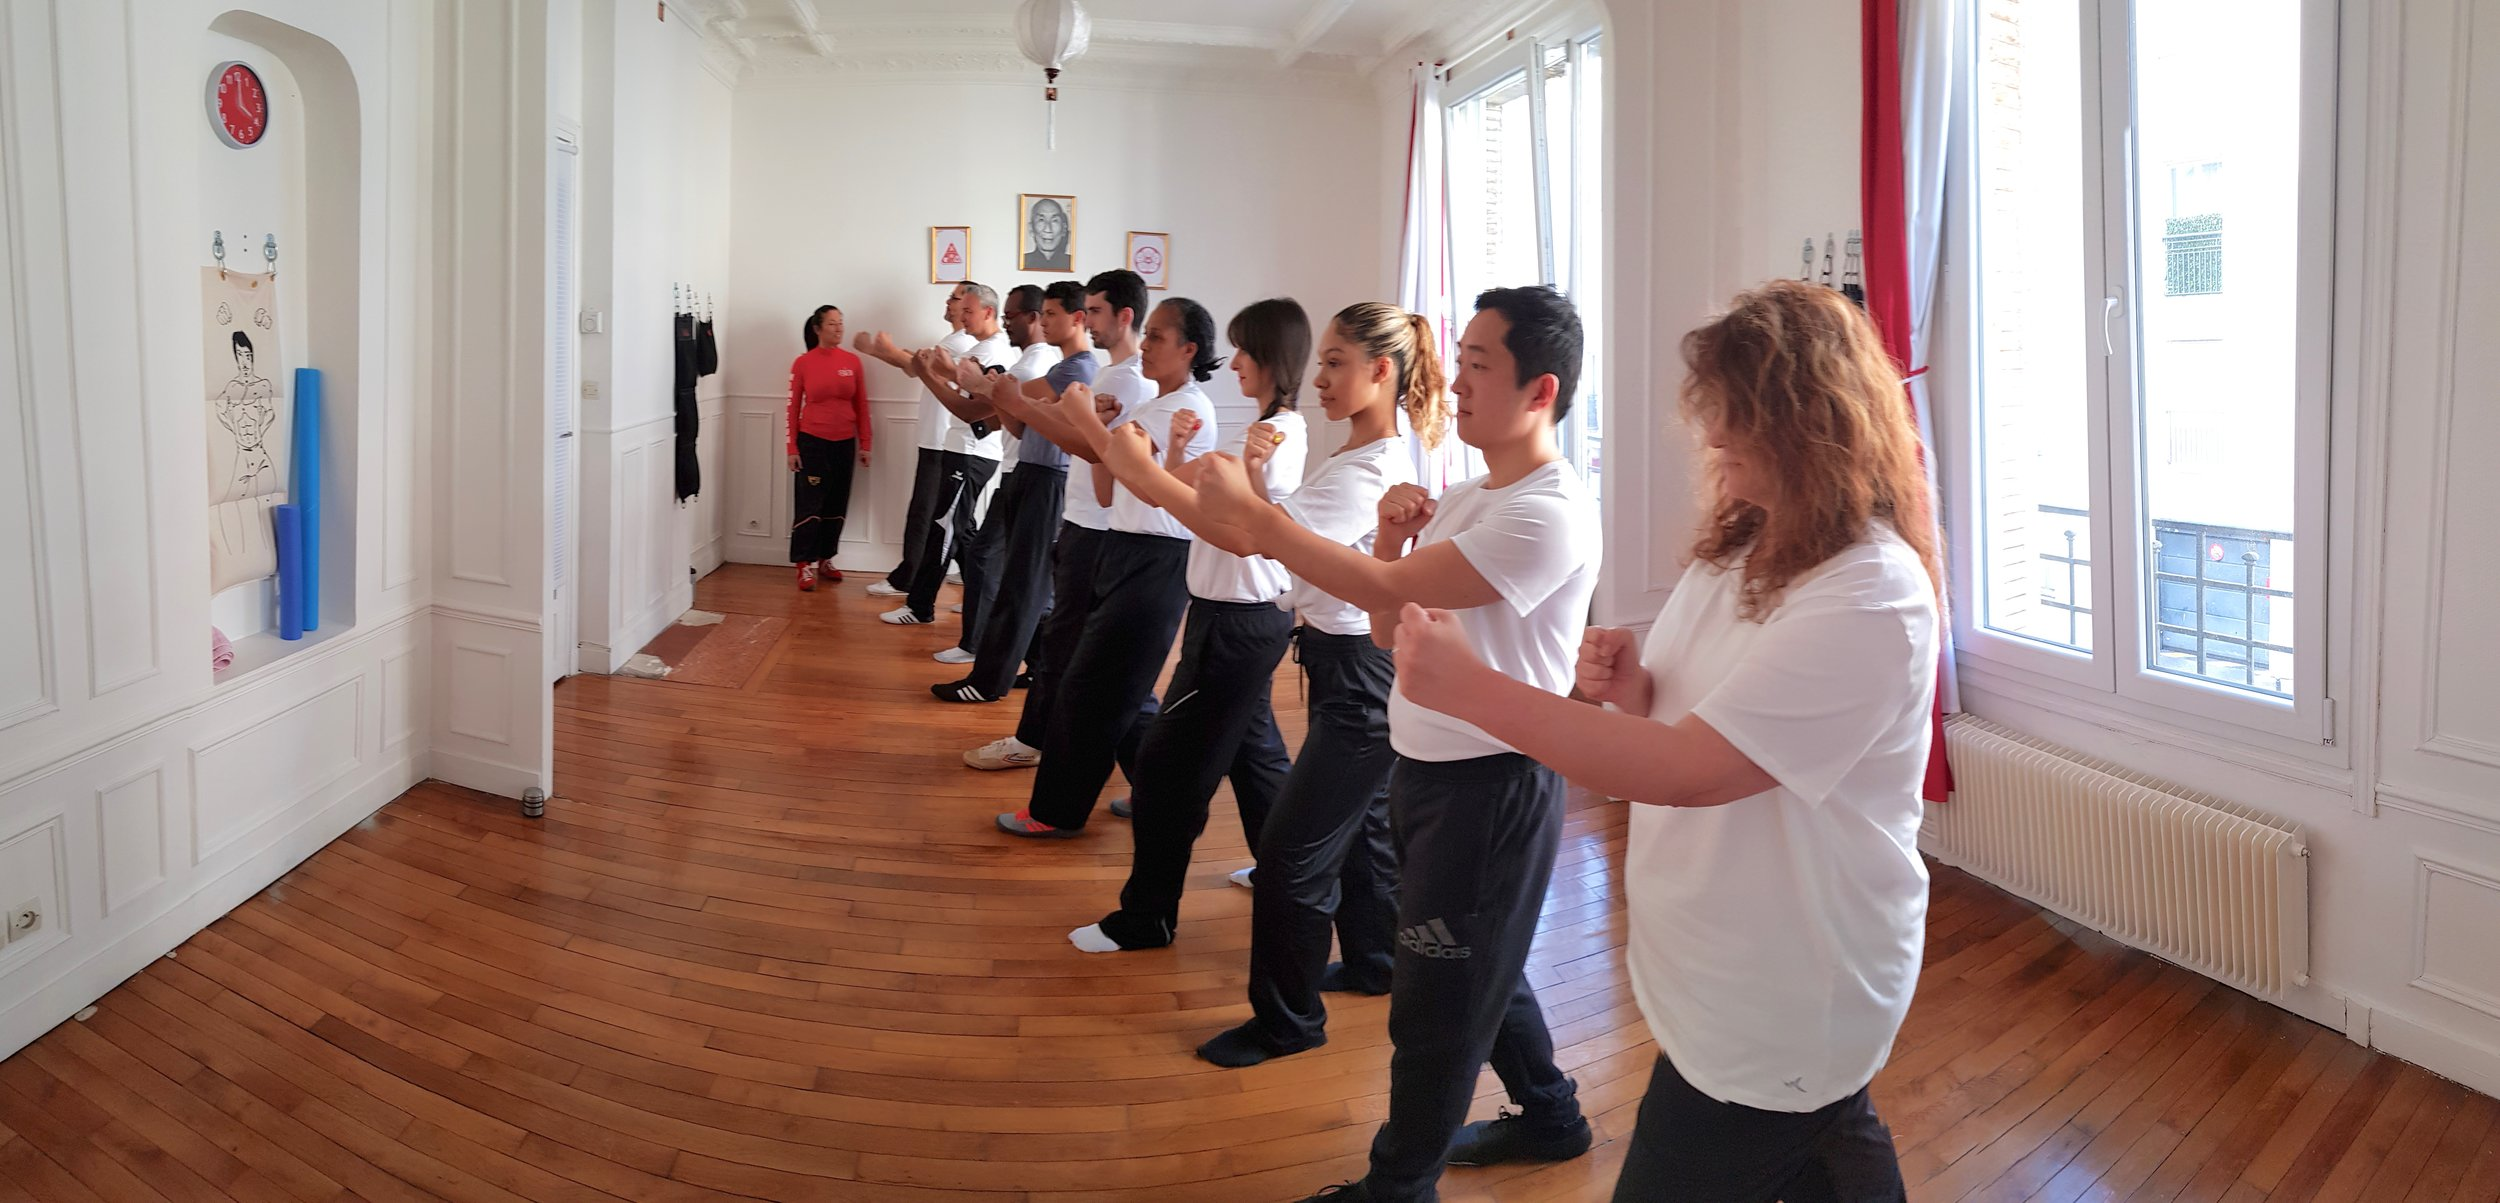 kung-fu-technique-paris-bruce-lee-yip-man.jpg